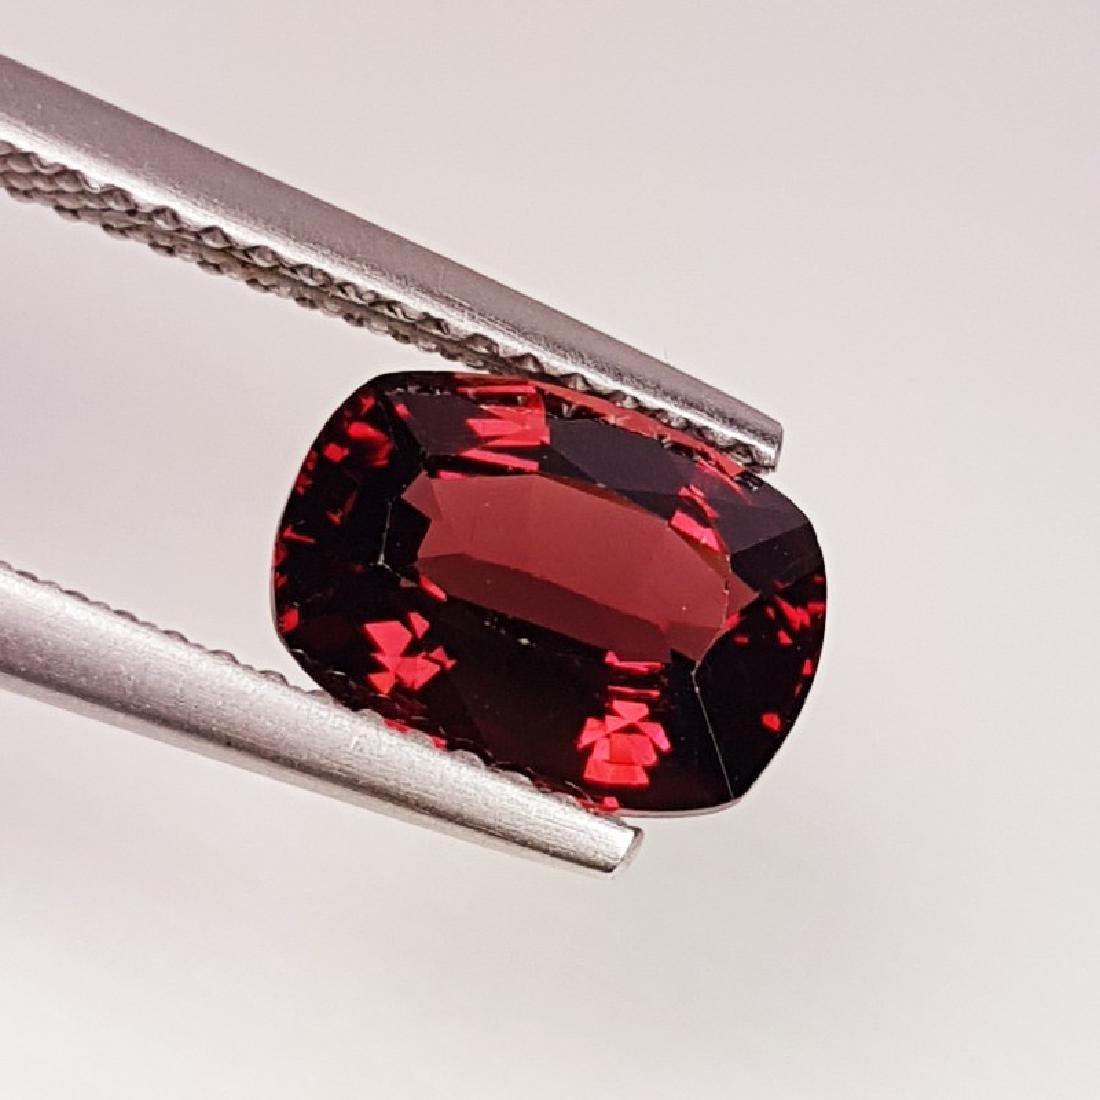 IGI CERTIFIED Natural Pyrope - Almandite Red Garnet -